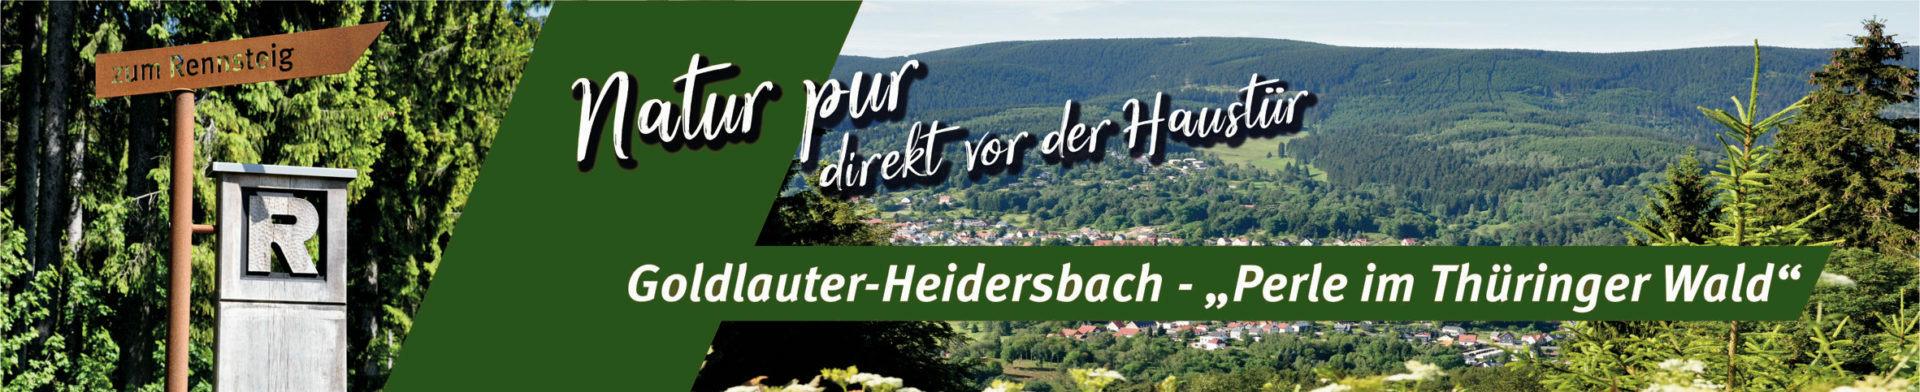 "Goldlauter-Heidersbach - ""Perle im Thüringer Wald"""